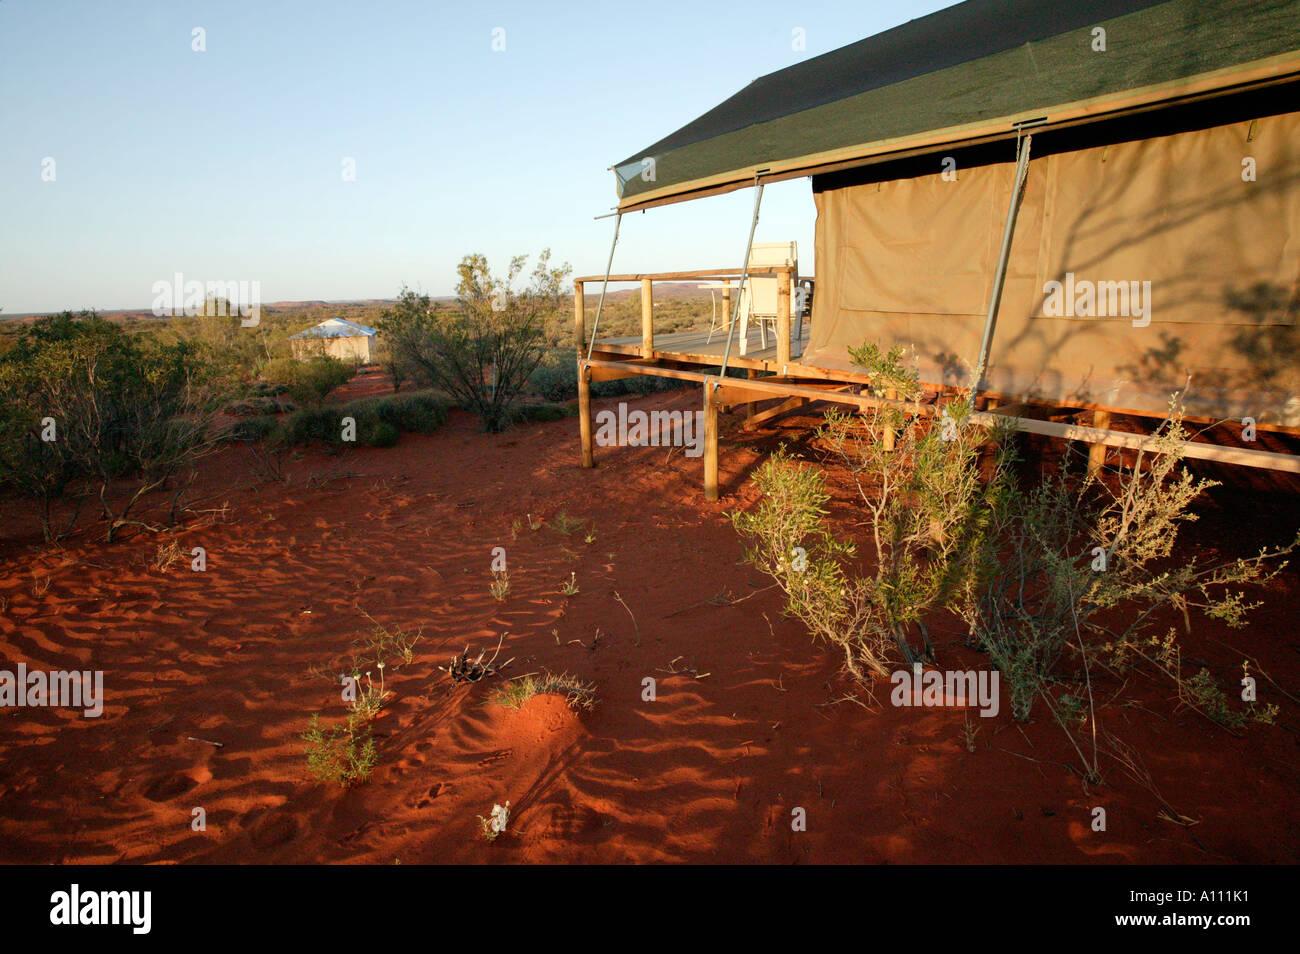 A luxury safari tent in the outback resort of Gunya Titjikala Simpson Desert Northern Territory Australia & A luxury safari tent in the outback resort of Gunya Titjikala ...